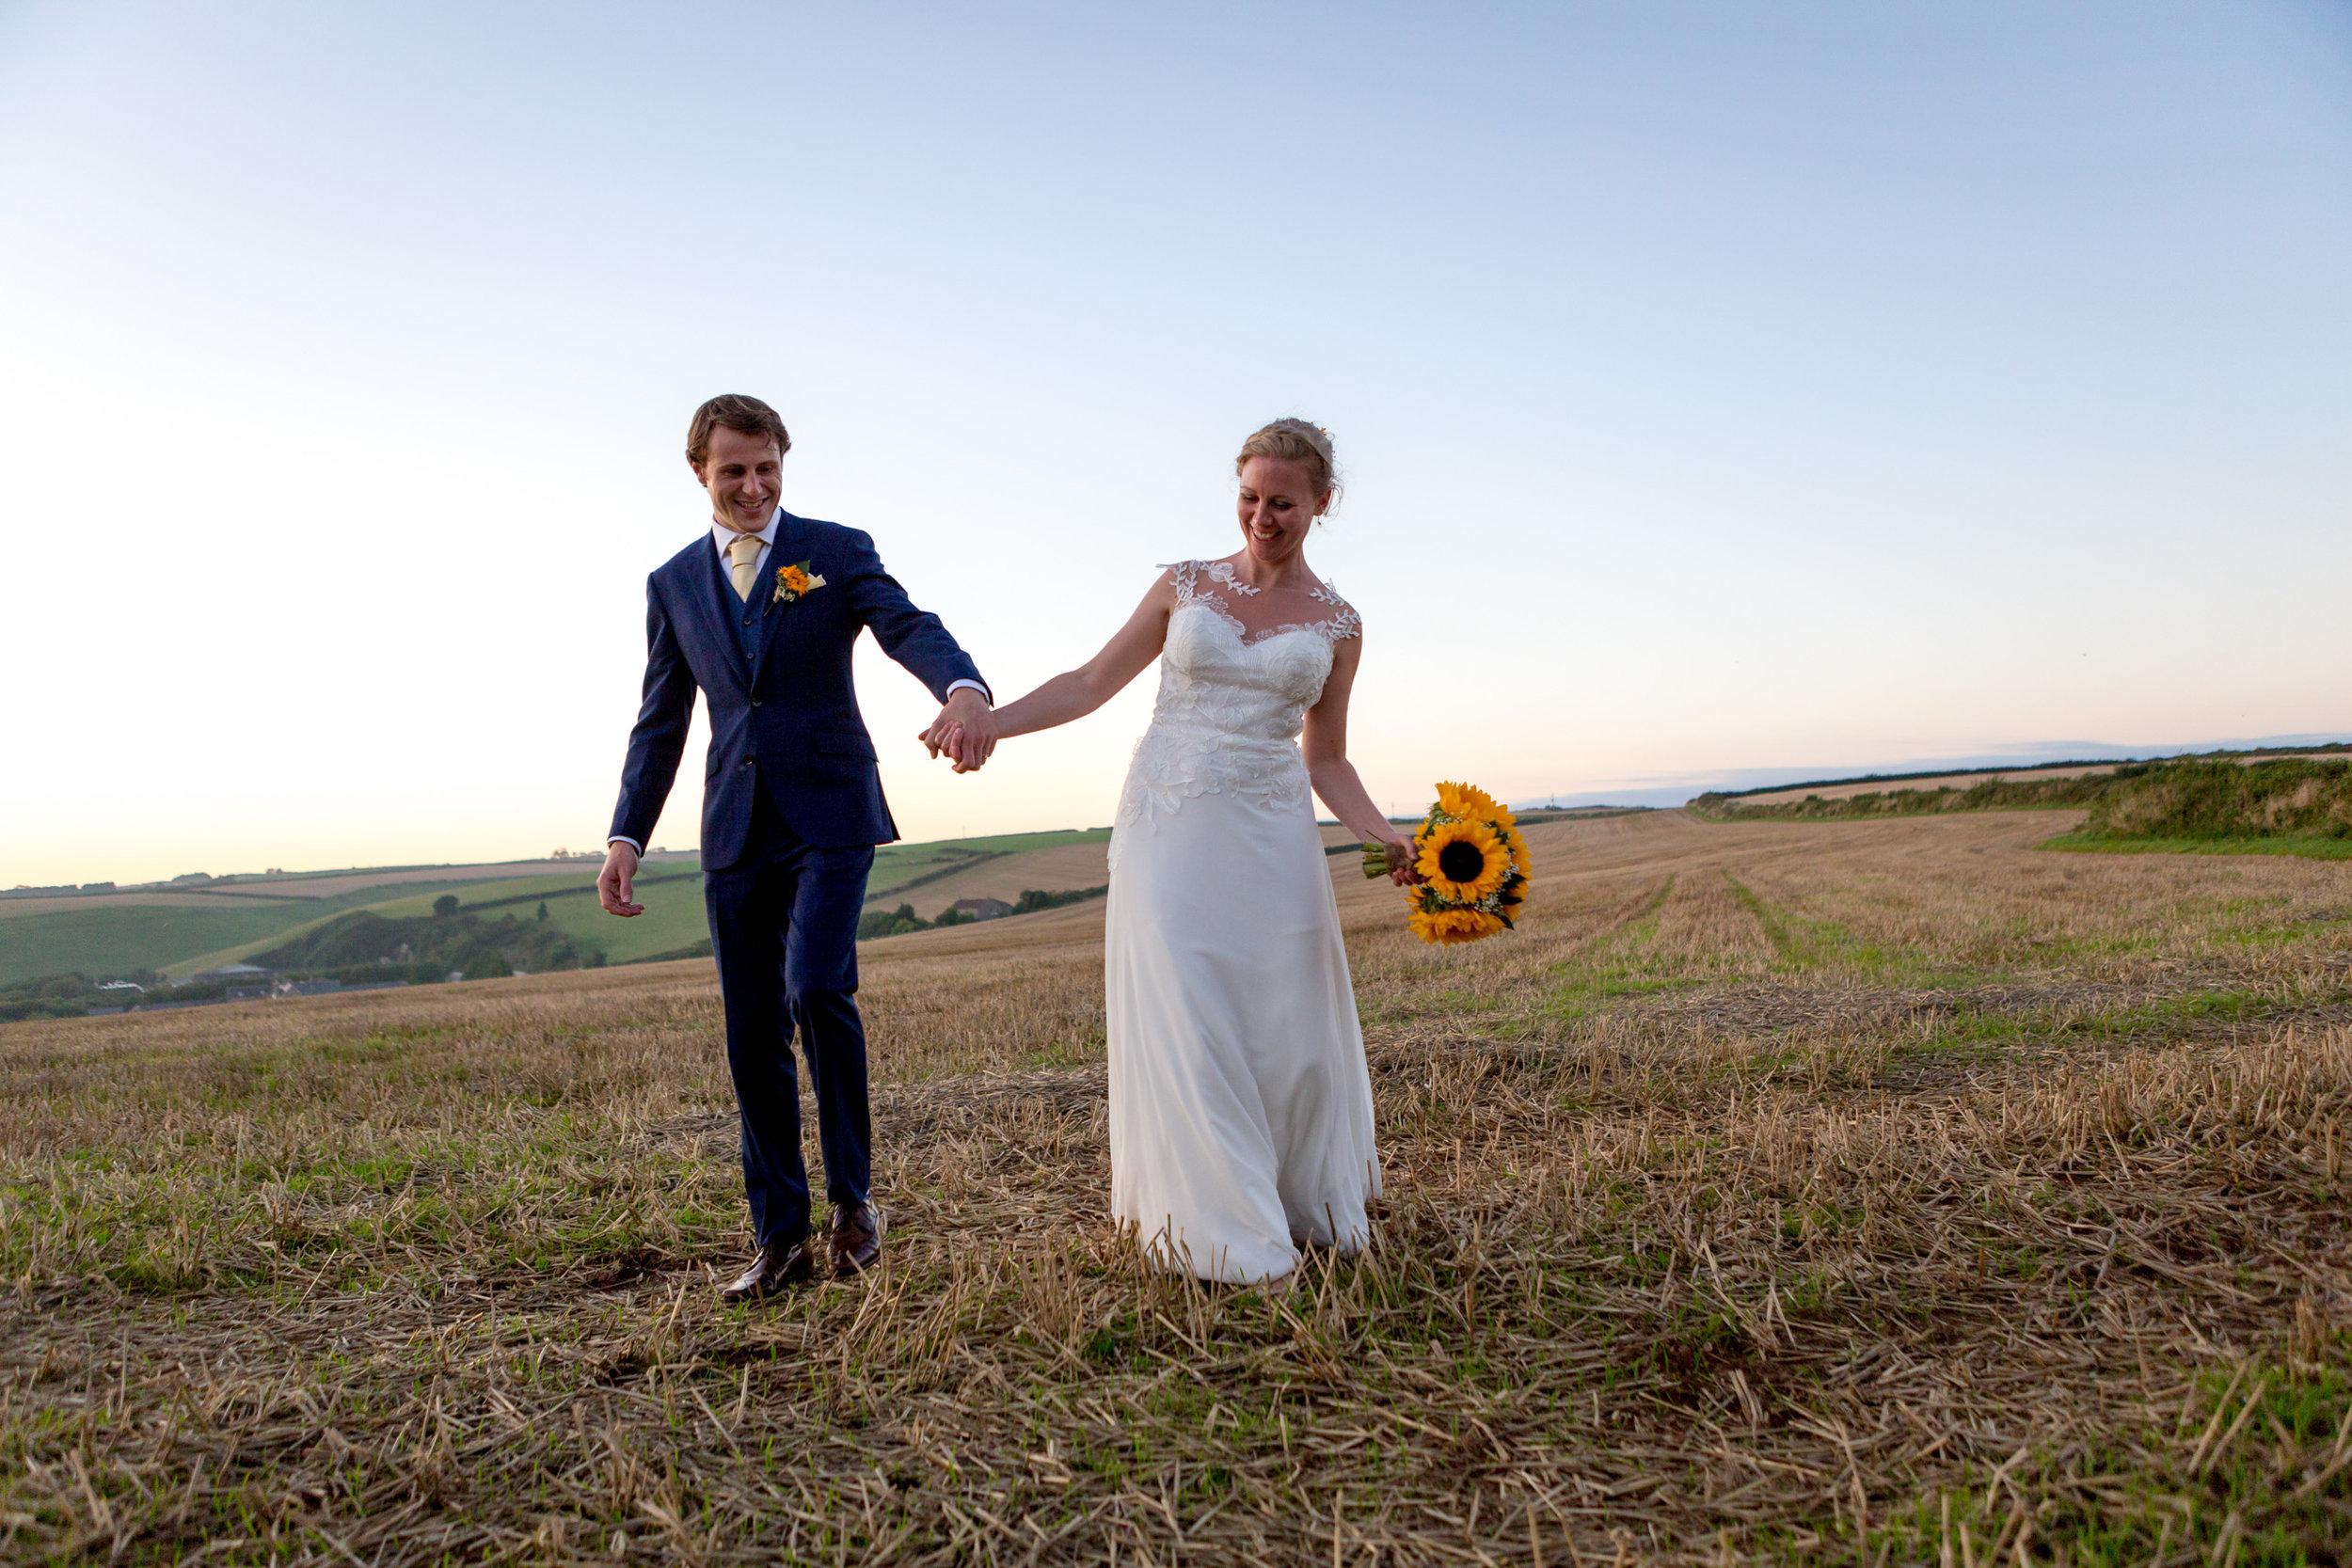 Bucklands-Tout-Saints-Hotel-Devon-Wedding-Photography-39.jpg